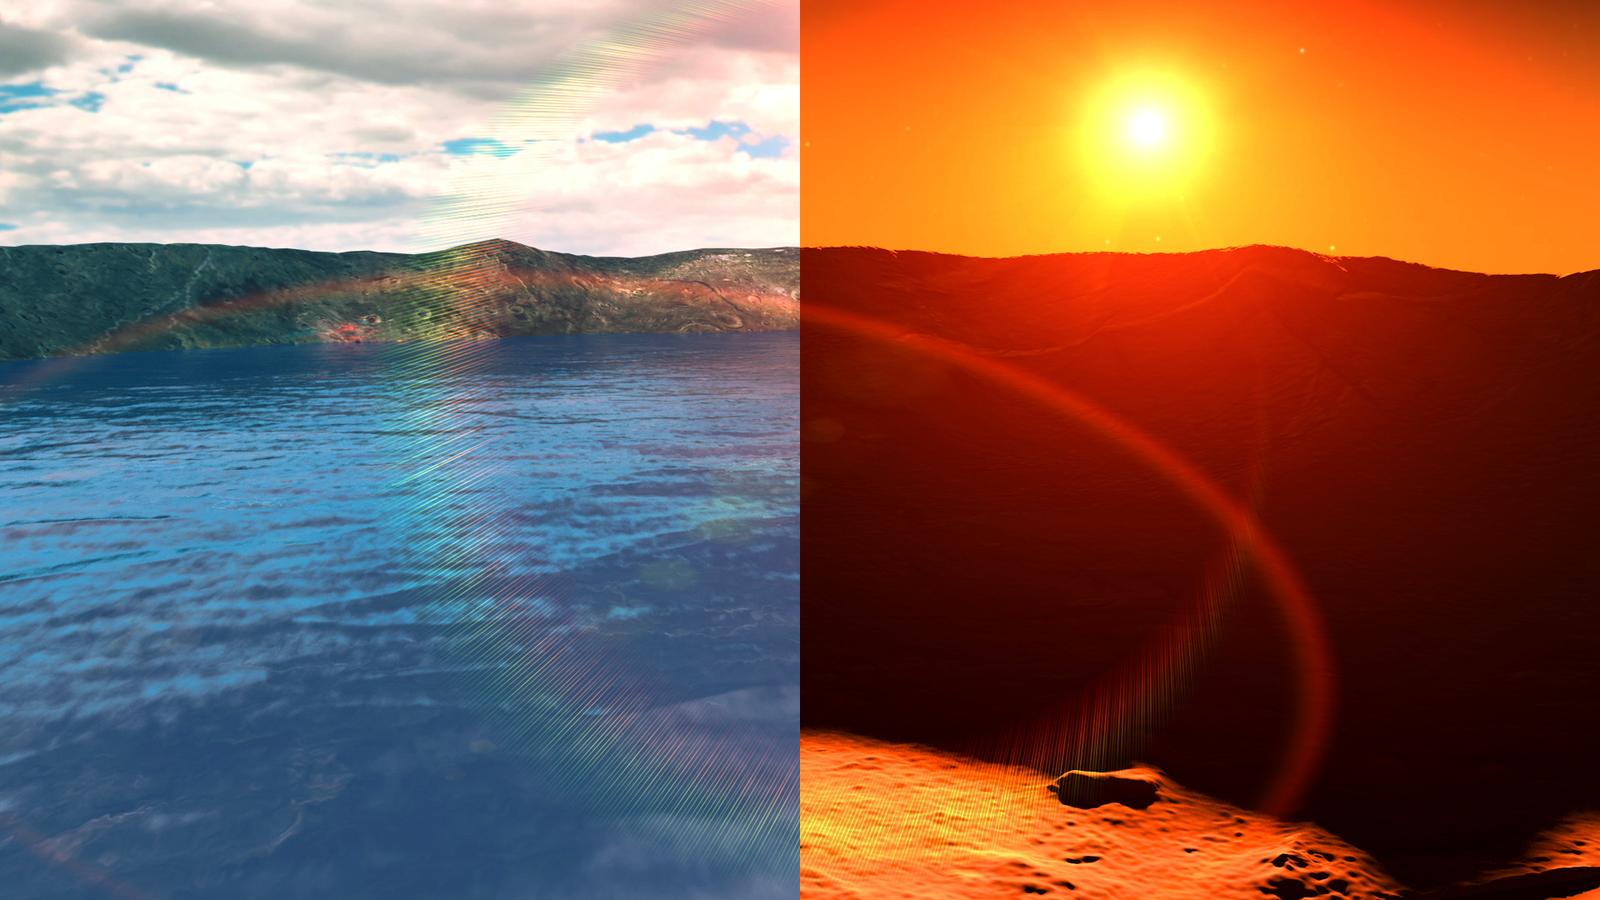 NASA's Mars Exploration Program : Multimedia - The Look of ...